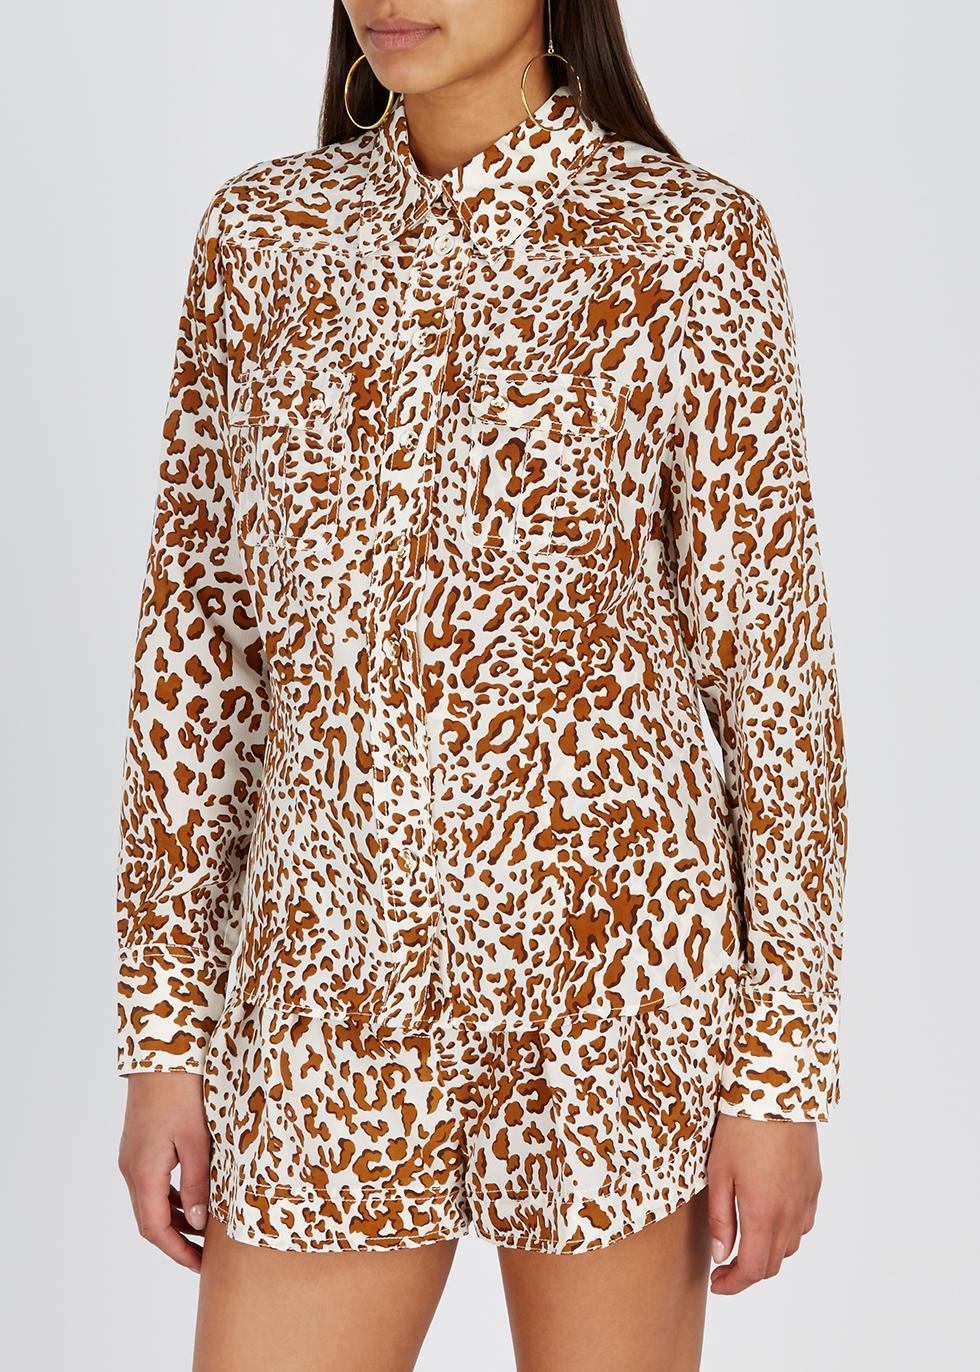 Utility leopard-print silk shorts - Zimmermann